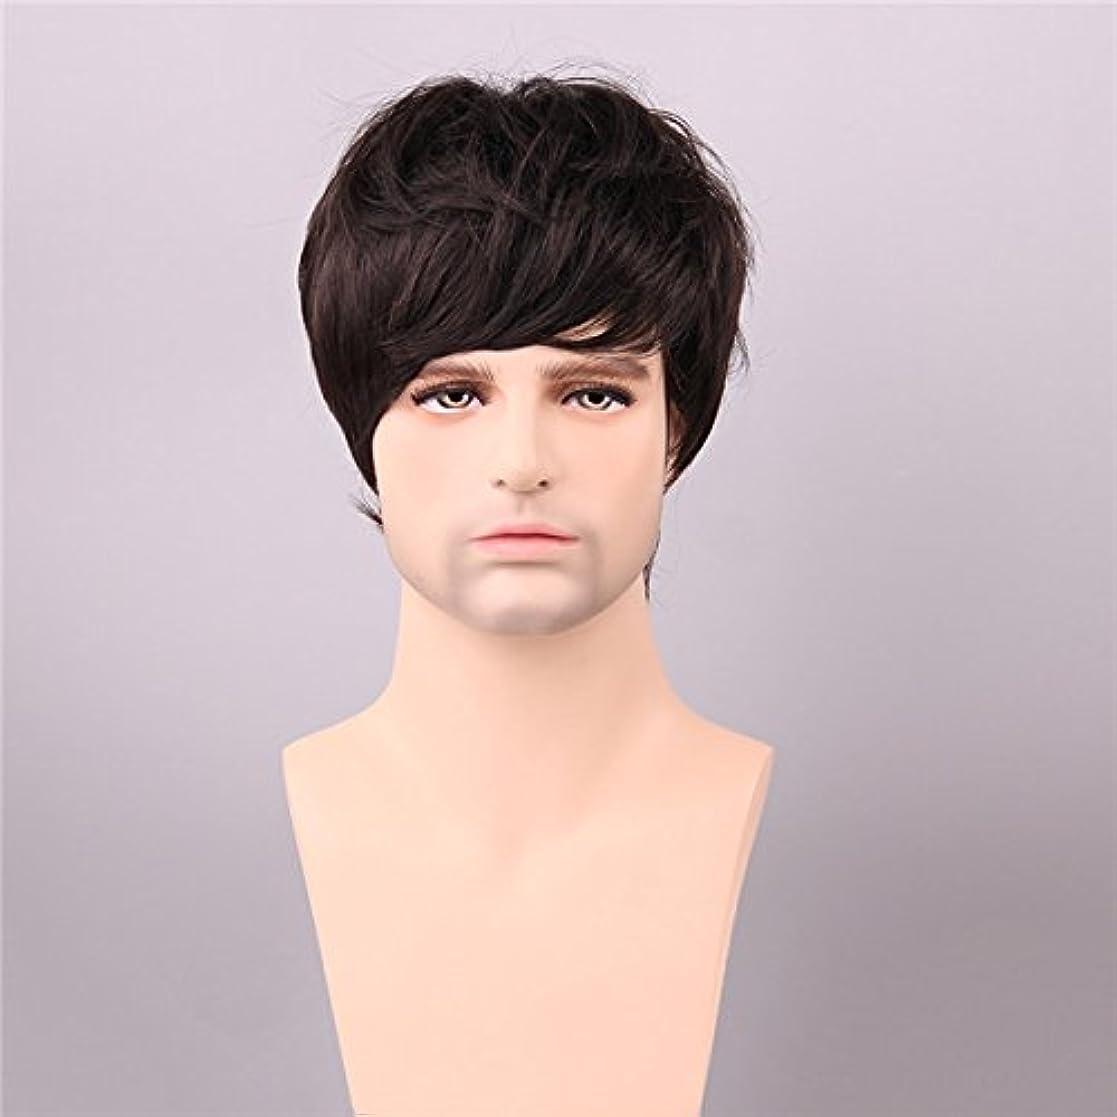 YZUEYT ミディアムブラウン人間の毛のウィッグショートモノトップ男性ヴァージンレミーキャップレスサイドバング YZUEYT (Size : One size)